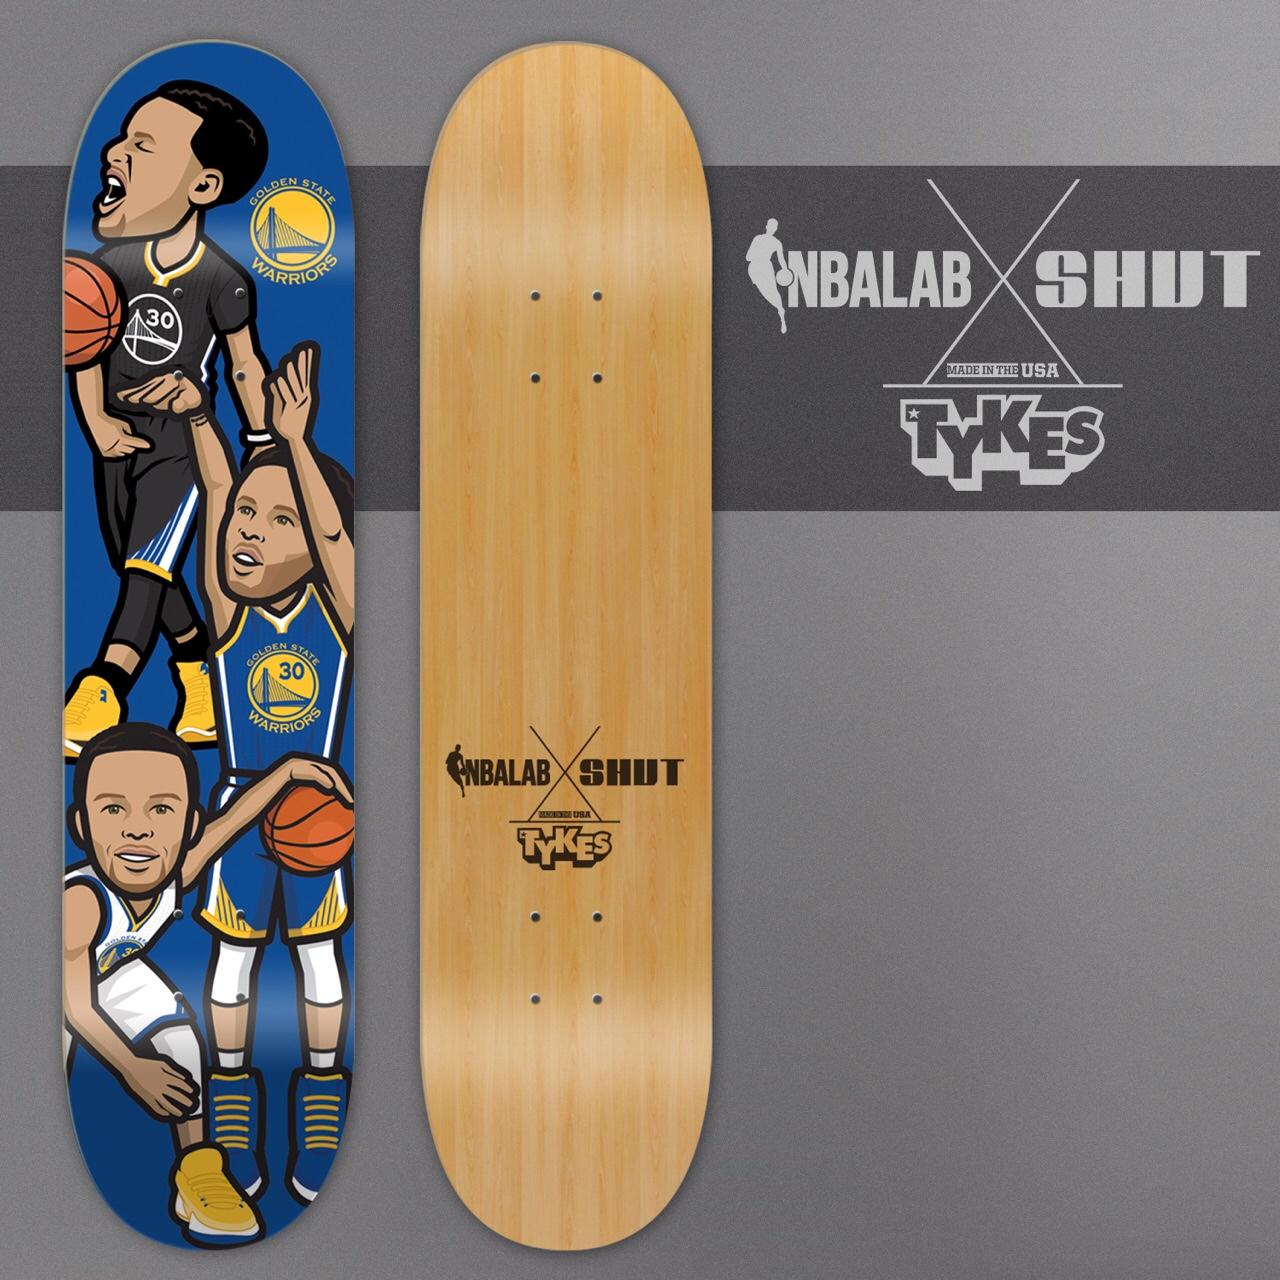 NBA LAB/SHUT SKATEBOARDS   Social media artwork became a series of official NBA skateboard decks, which were promoted via a social media campaign partnership.